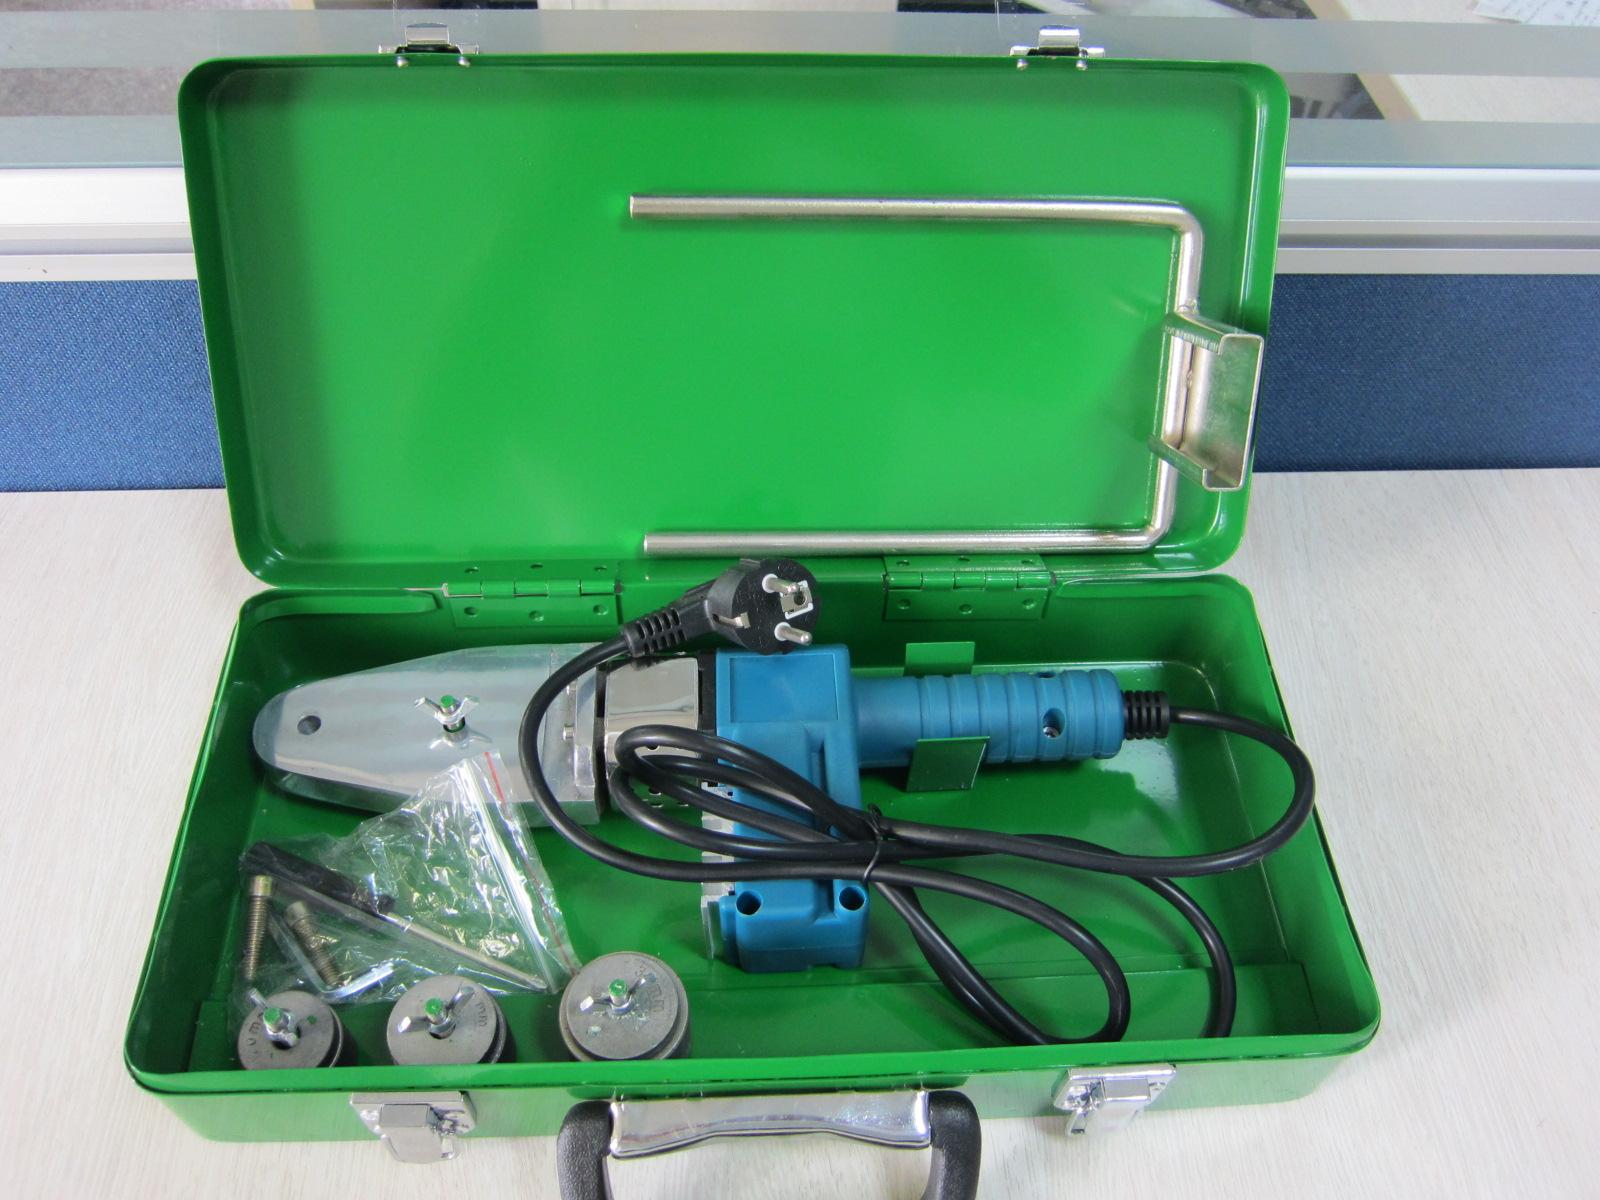 Ht aa electirc digital screem ppr pipe welding tool